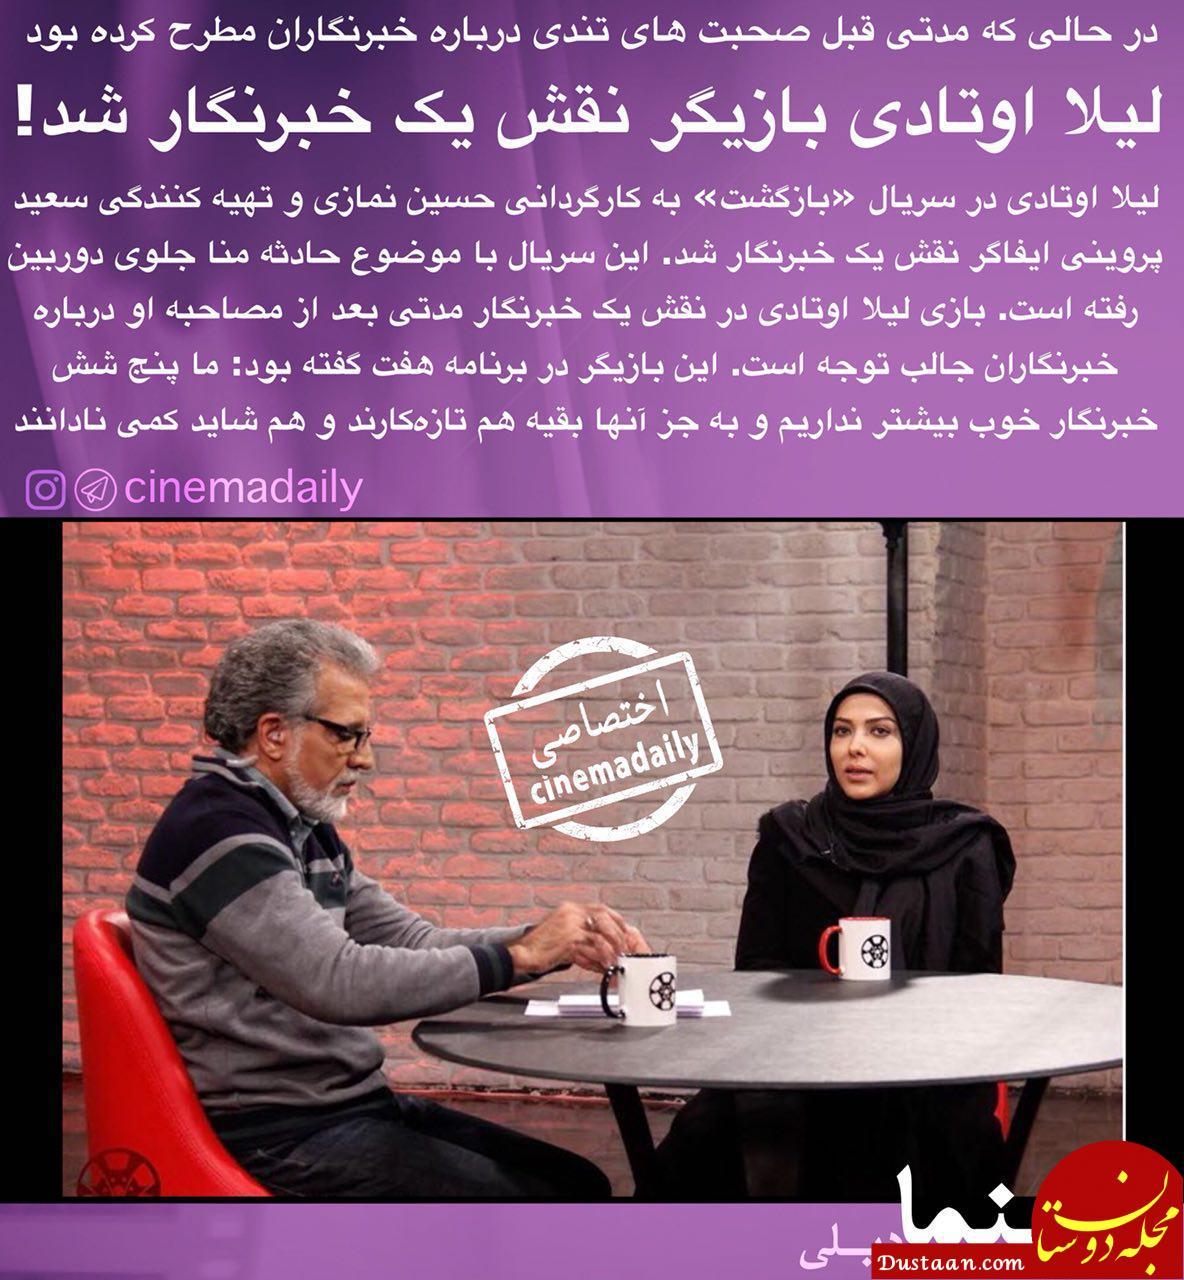 www.dustaan.com لیلا اوتادی در نقش یک خبرنگار +عکس